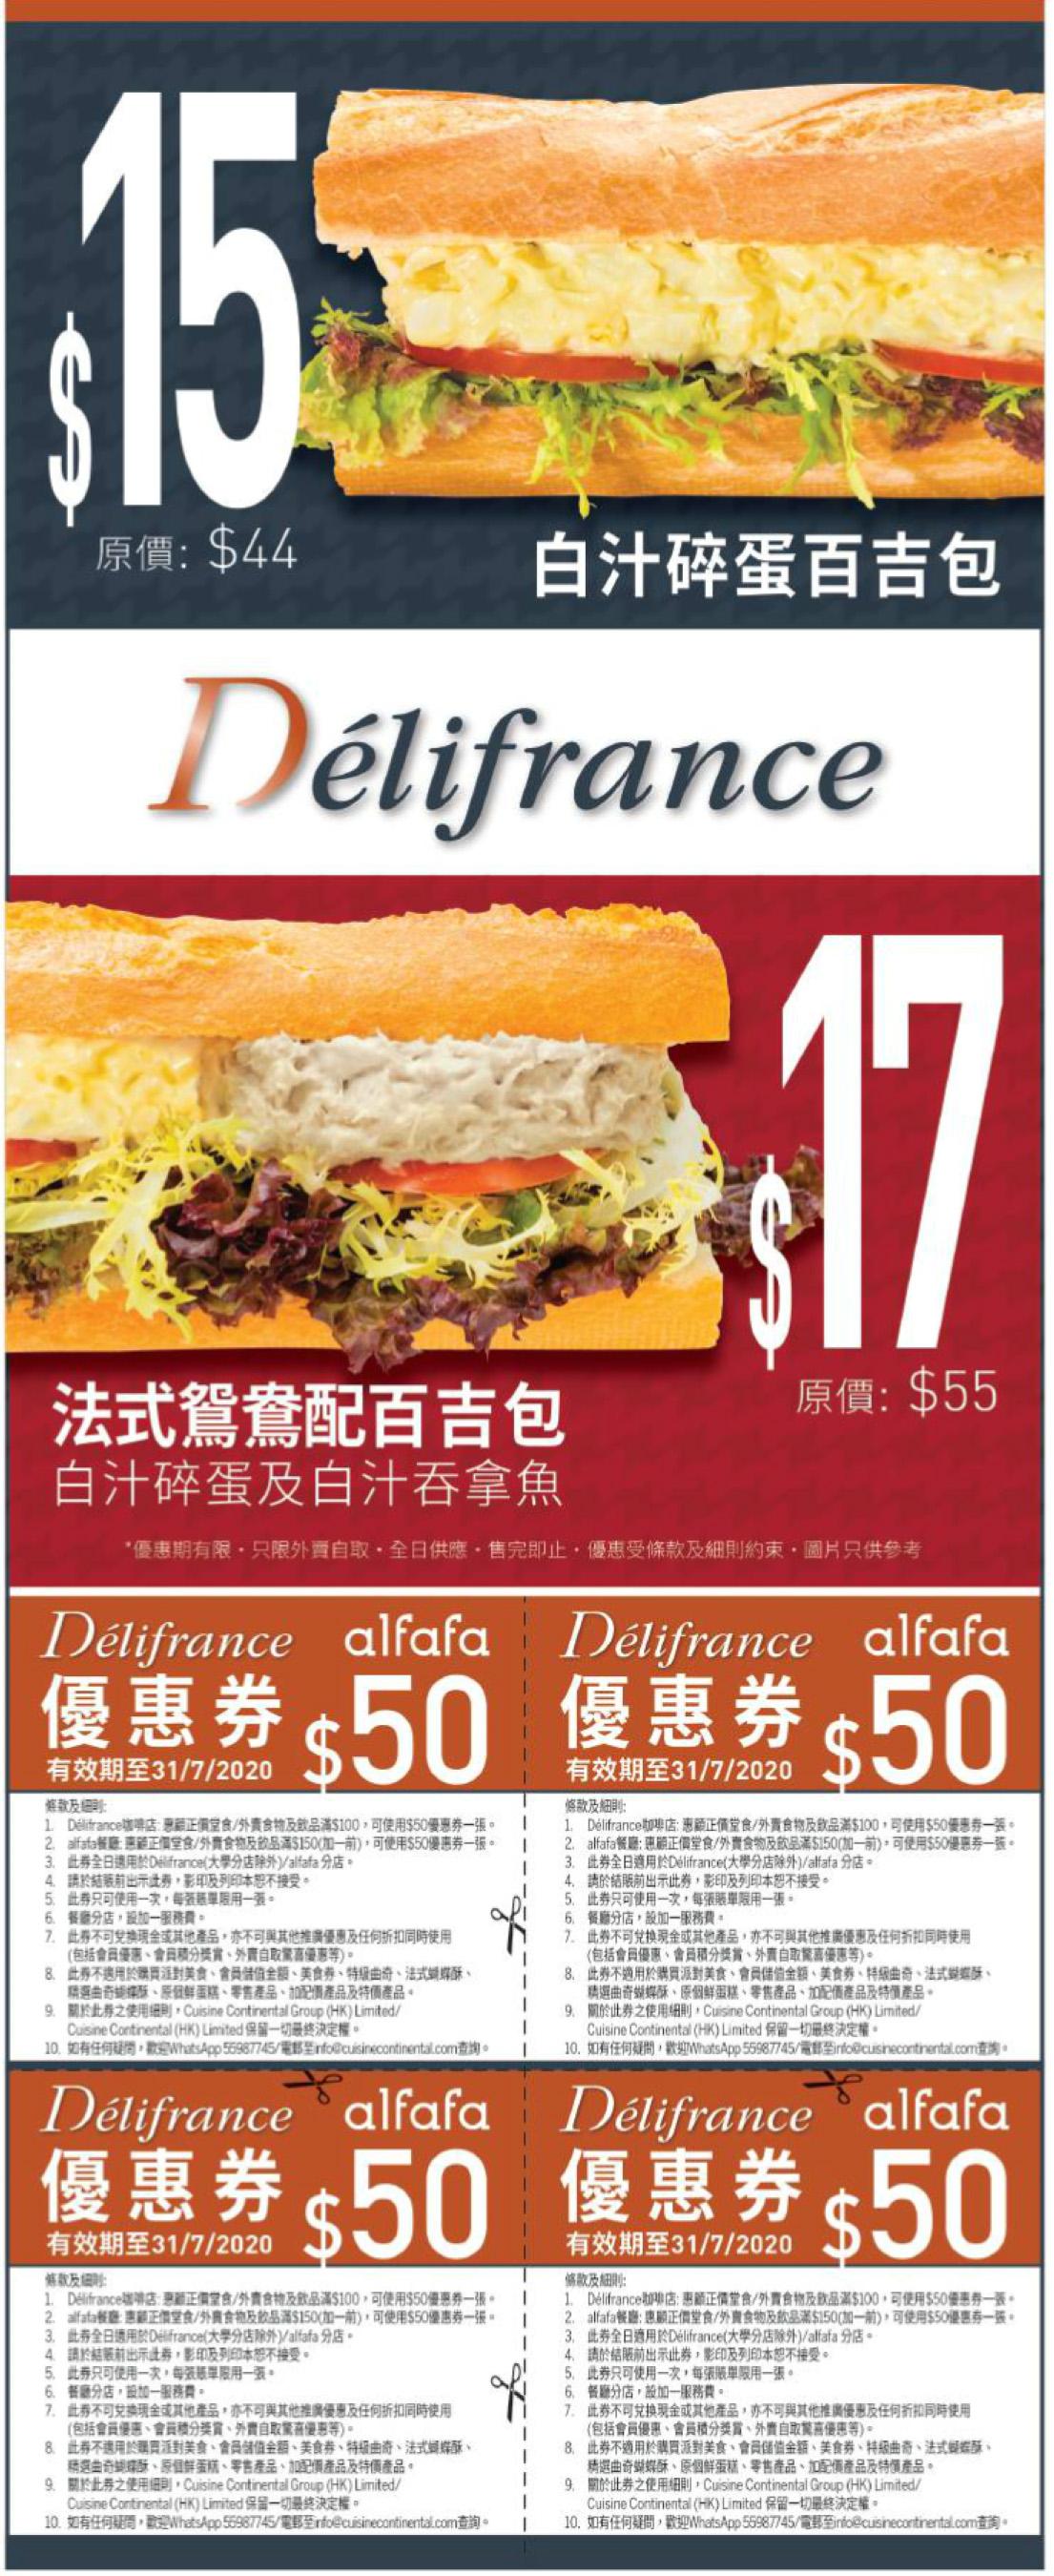 Delifrance: $50優惠券 至7月31日